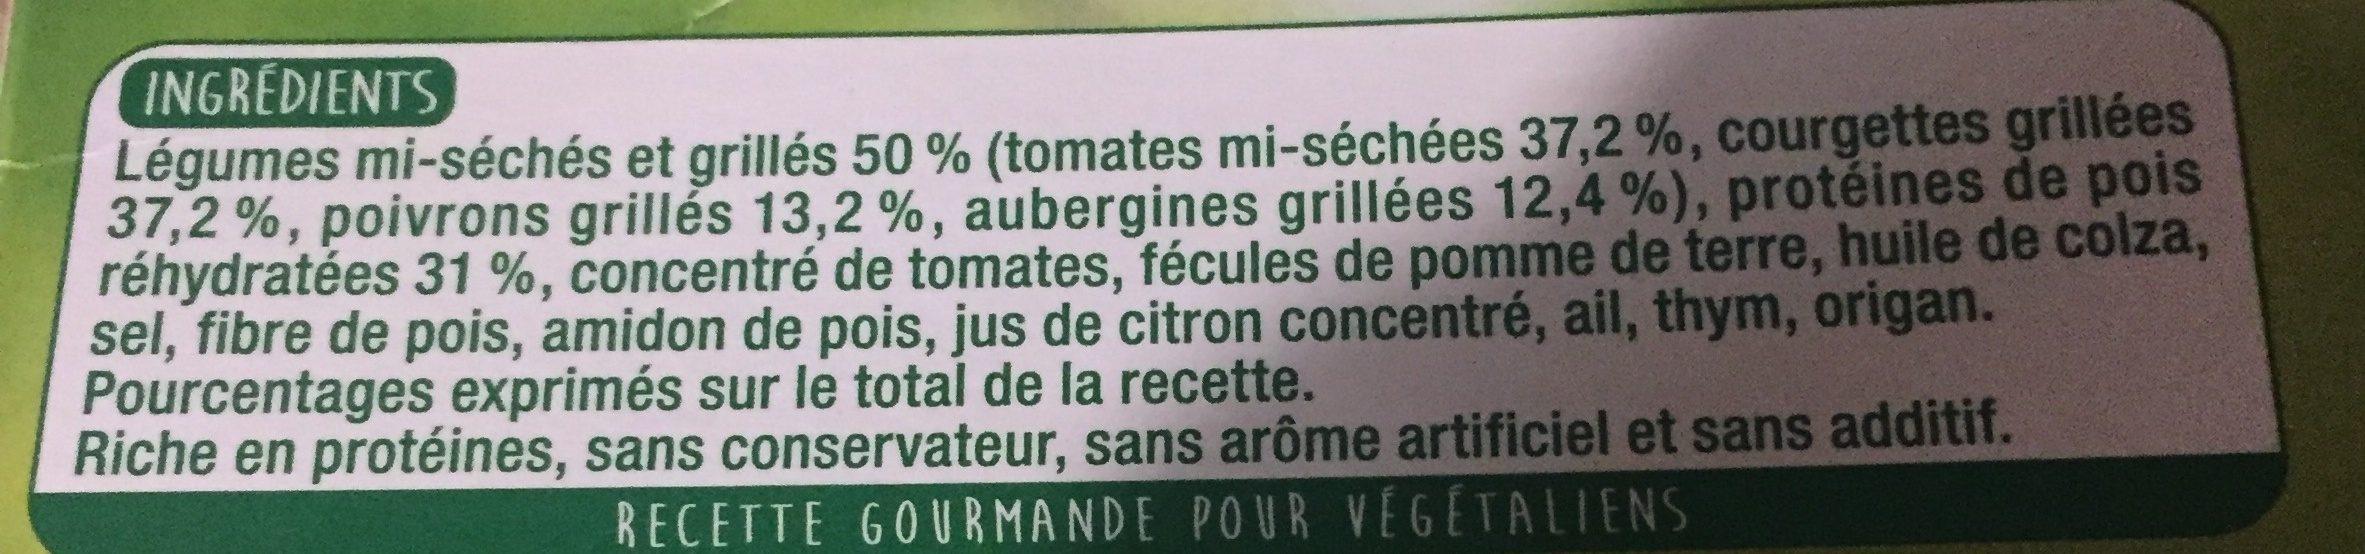 Steaks de legumes - Ingredients